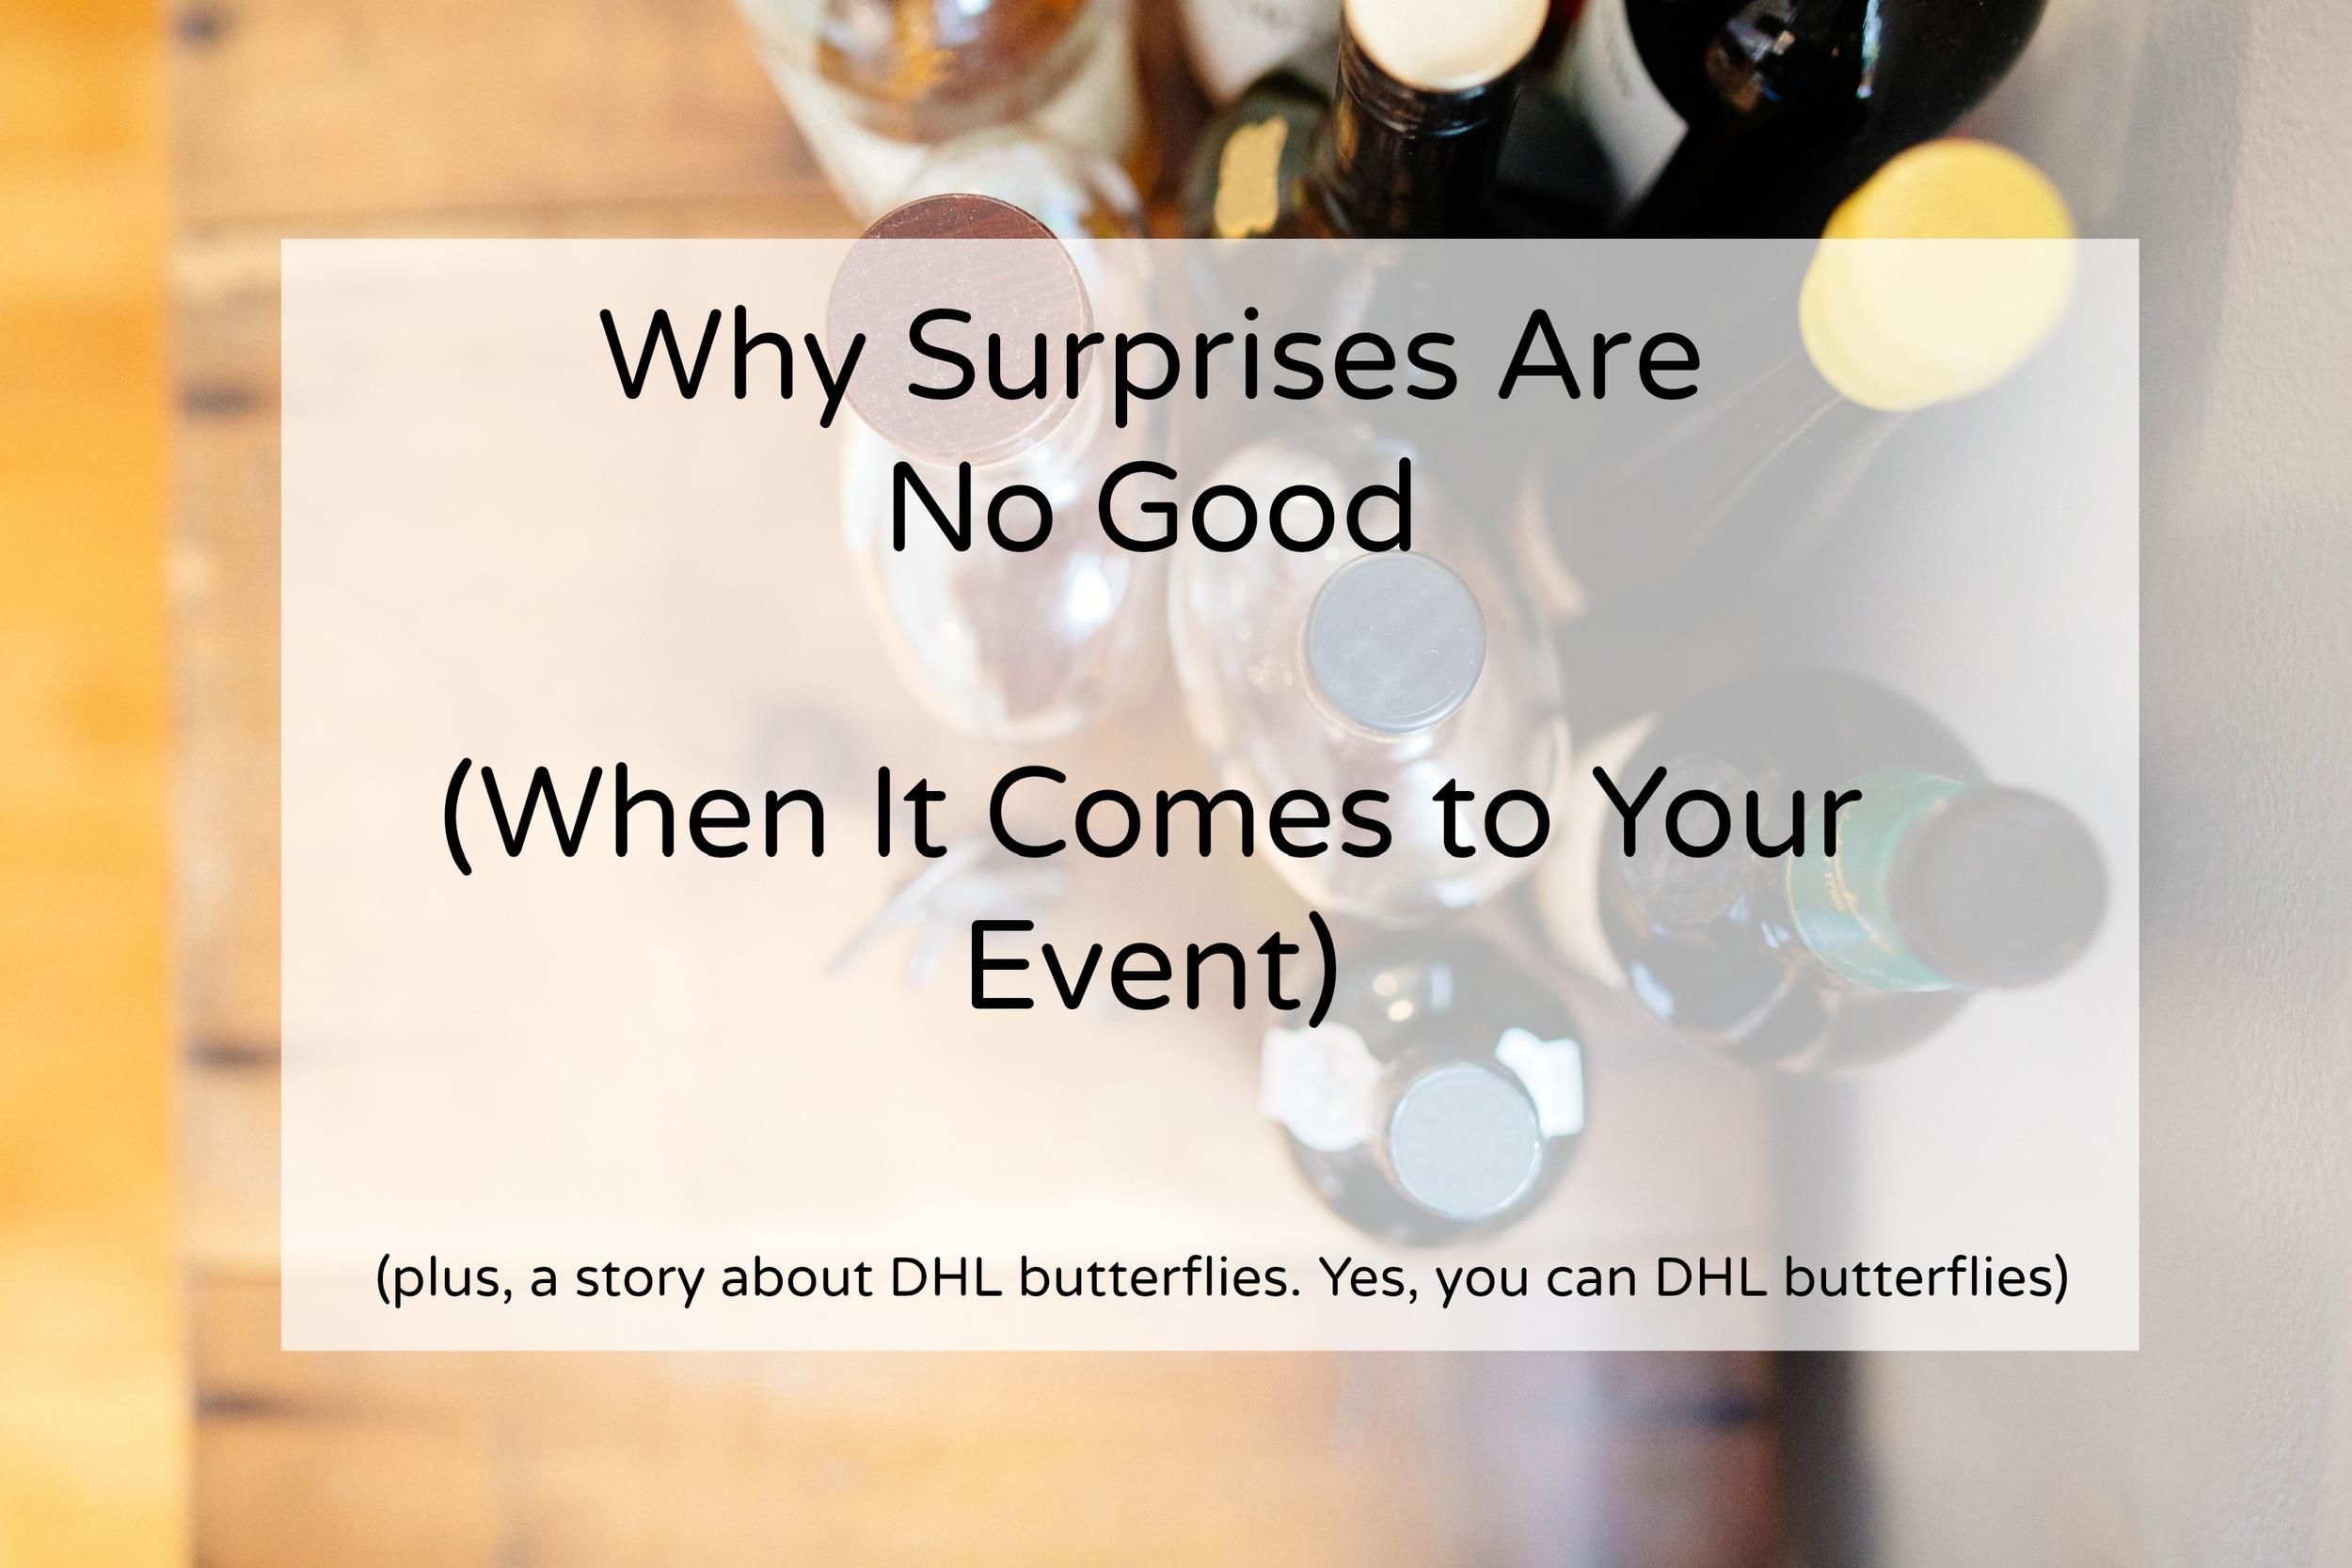 Why_Surprises_Are_No_Good_Workshop_Planner.jpg